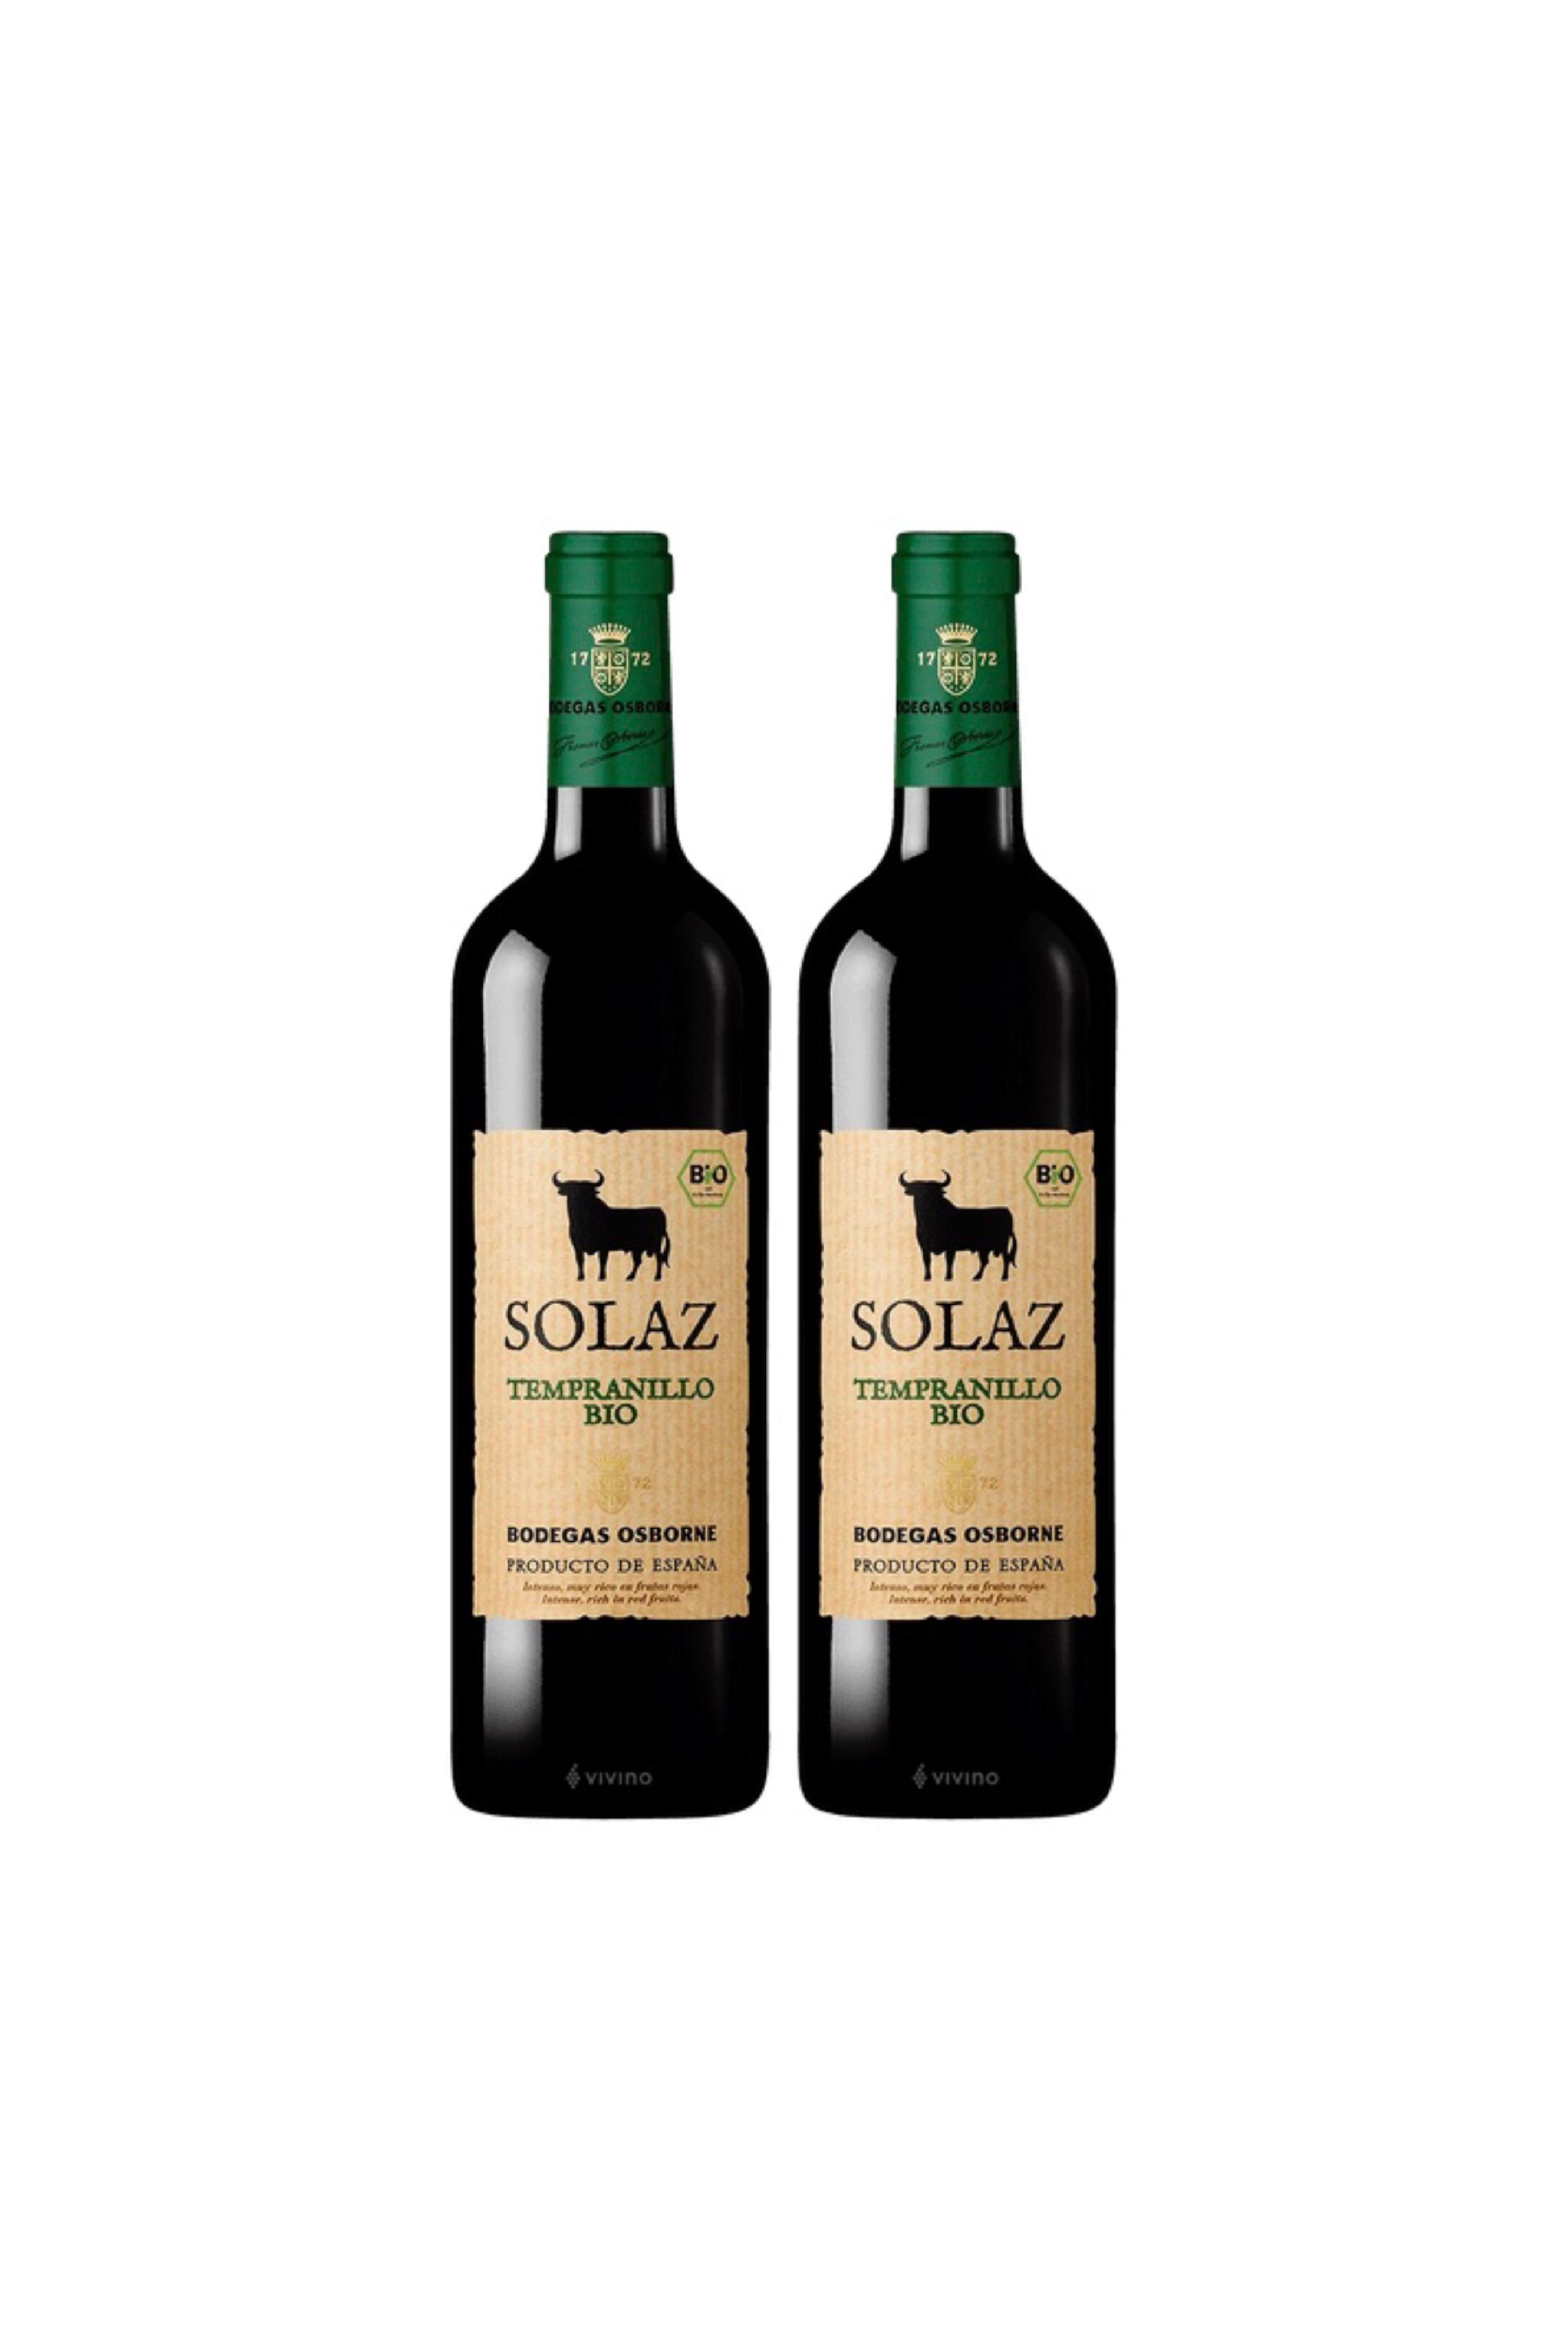 Spanish Organic Wine at $78 for 2 bottles!